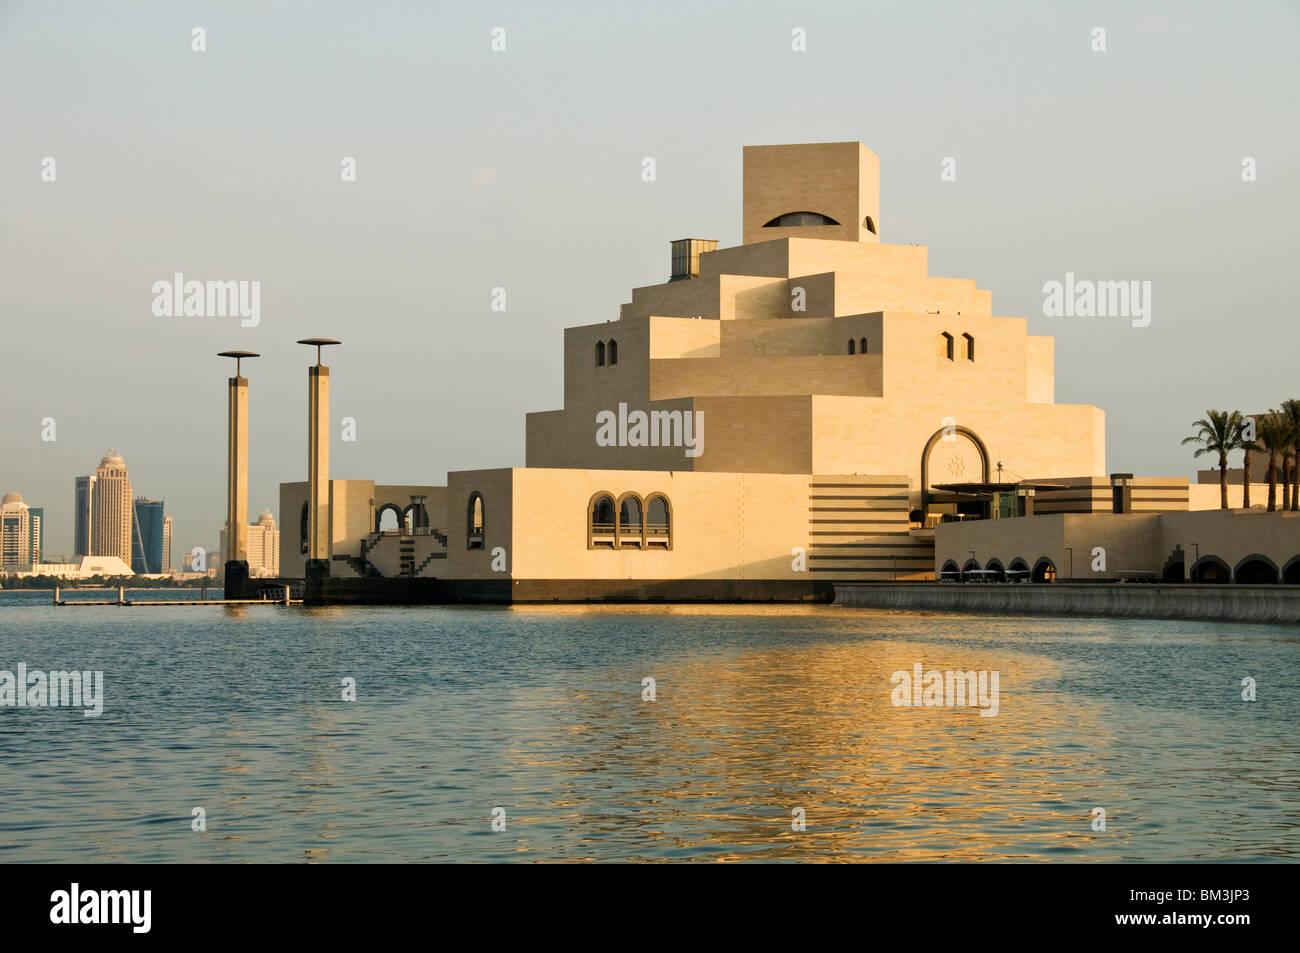 Qatar, Doha, Musée d'Art Islamique, I M Pei architecte 2008 Photo Stock